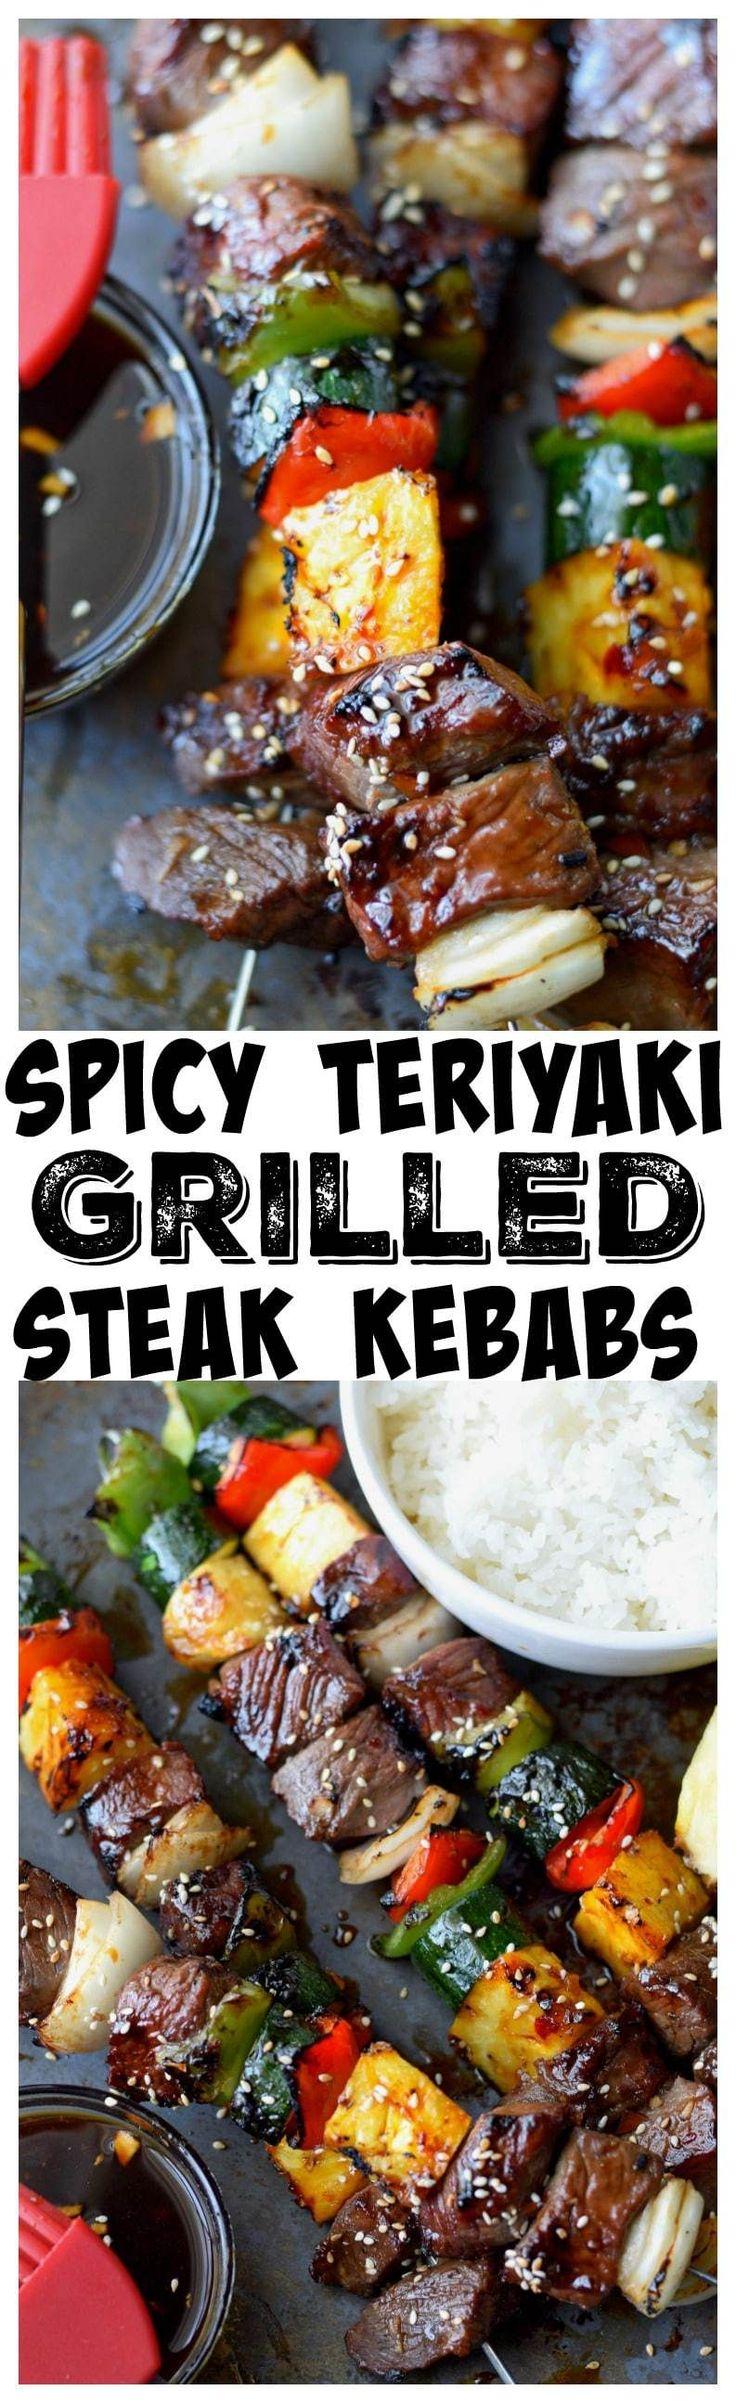 Spicy Teriyaki Grilled Steak Kebabs are so full of flavor, loaded with veggies and tender juicy meat, super easy to make.